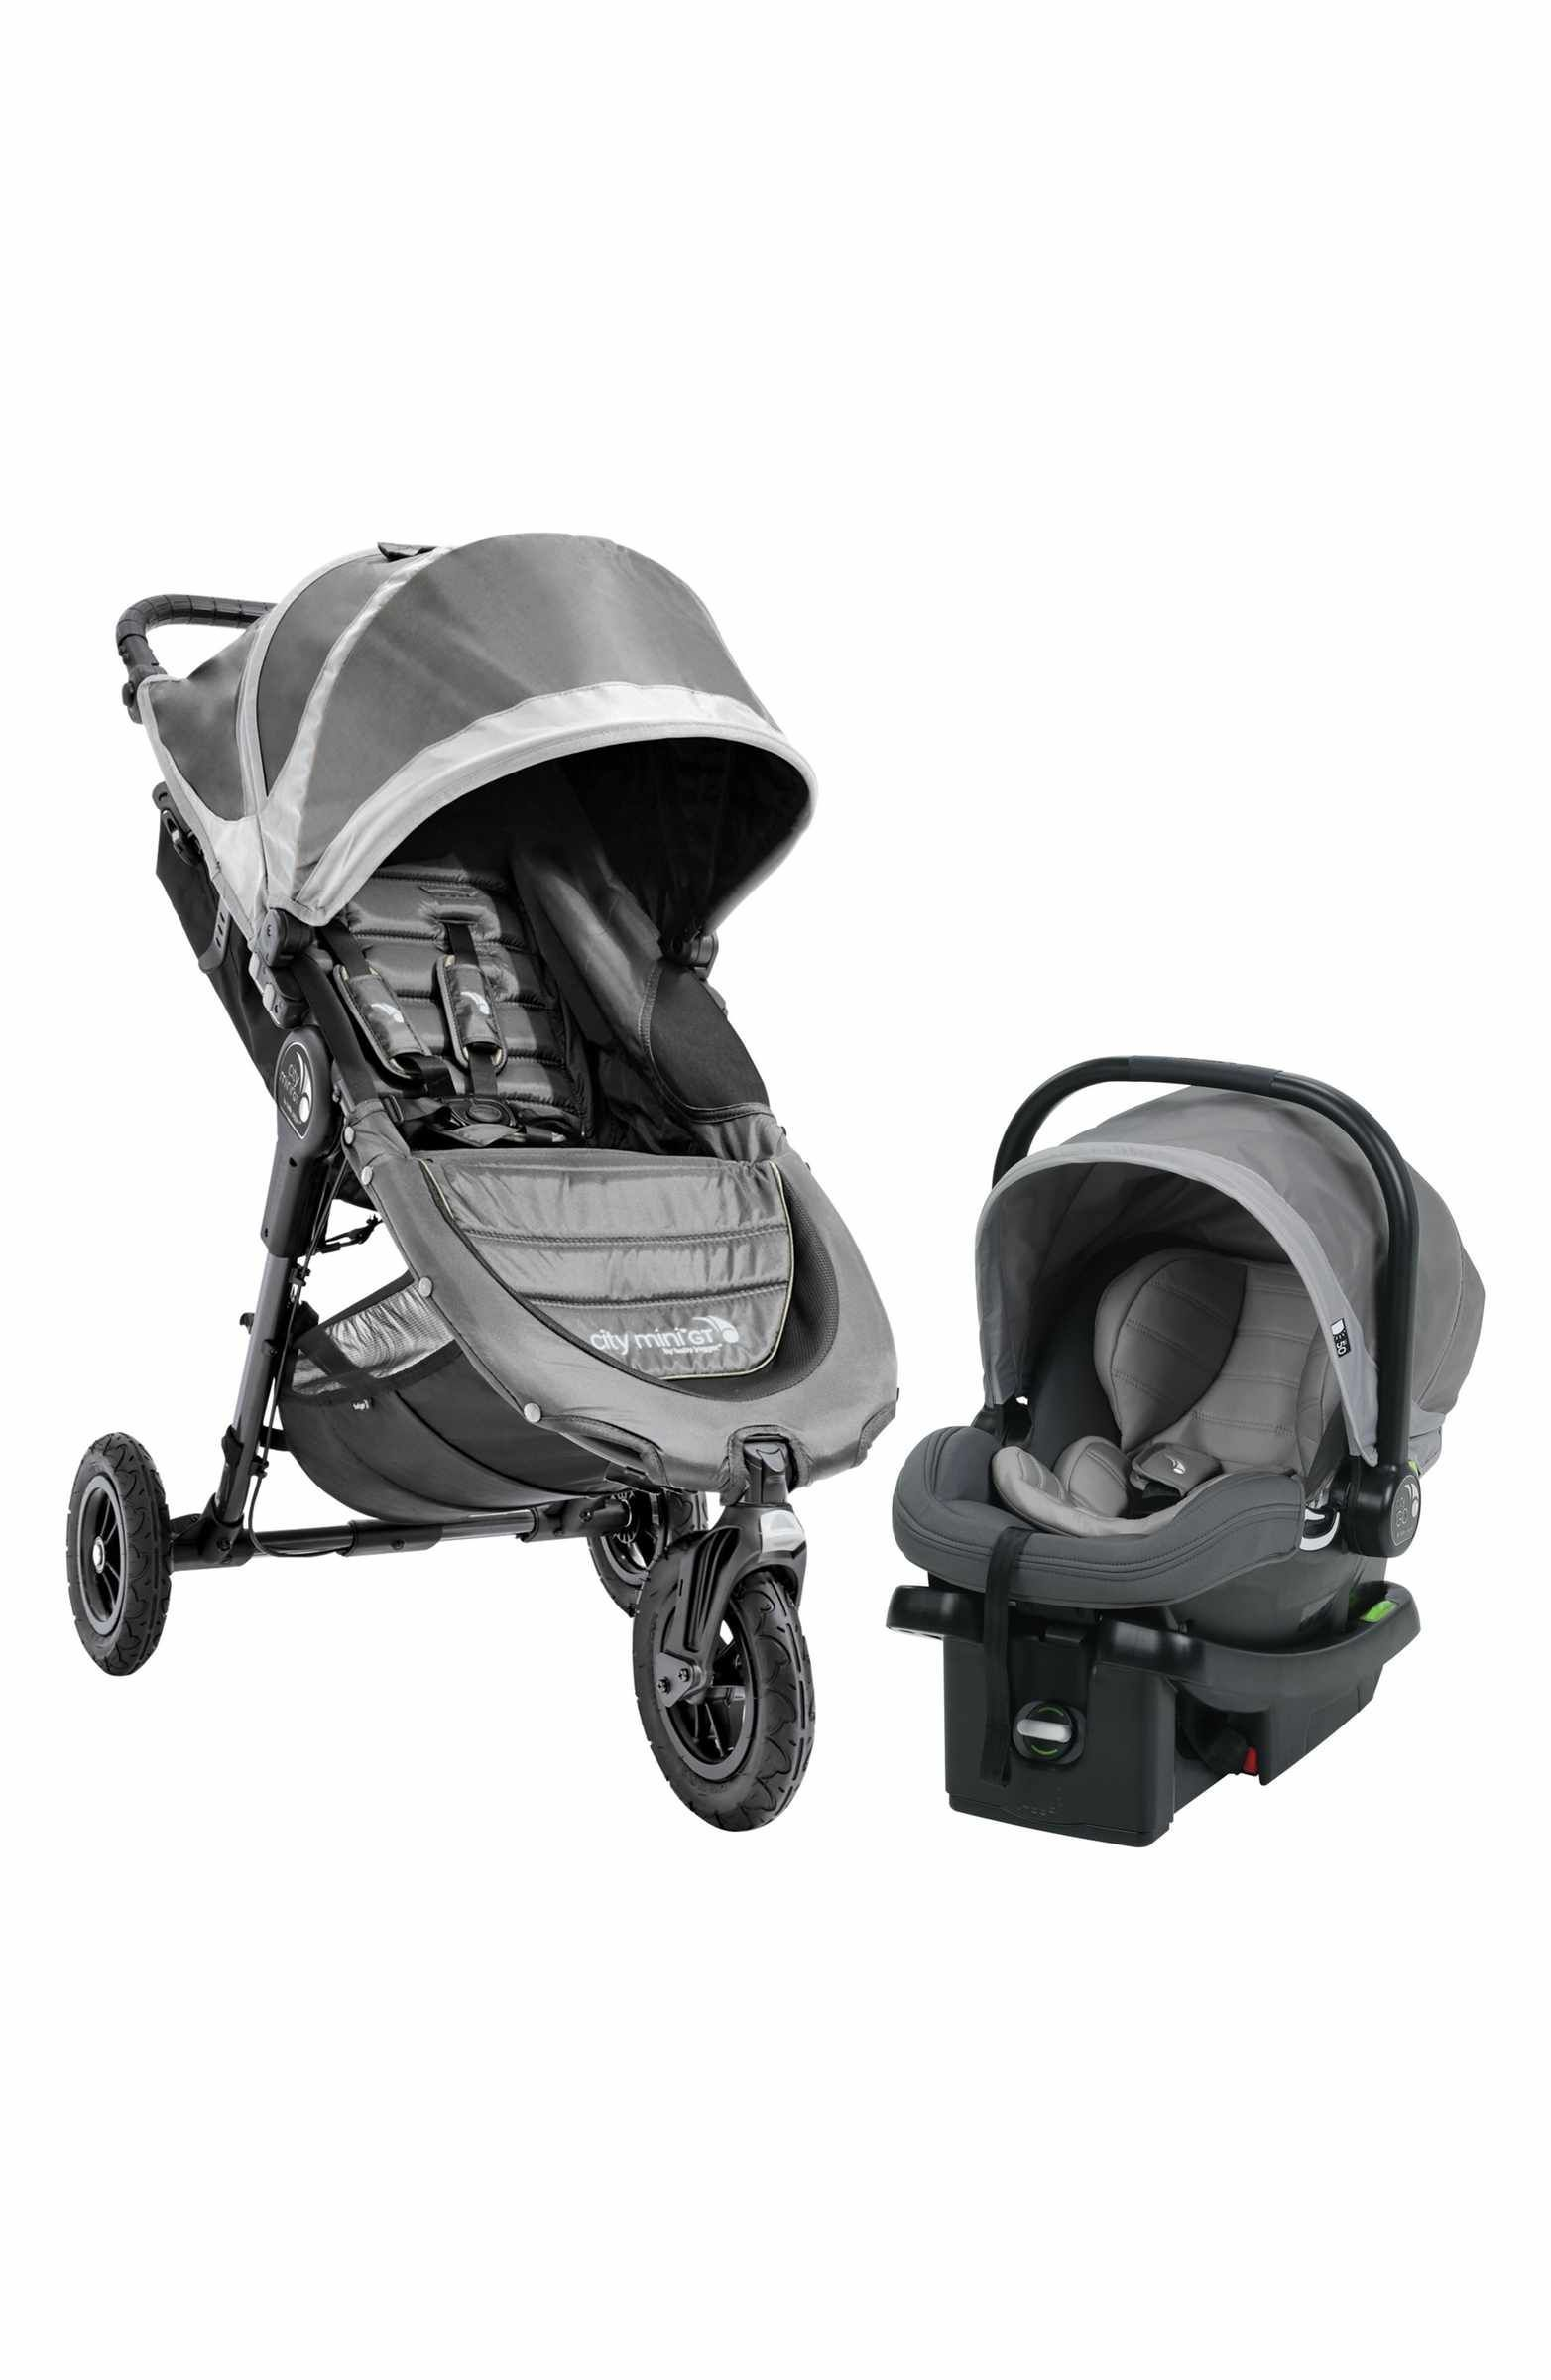 Main Image Baby Jogger City Mini Gt Stroller City Go Infant